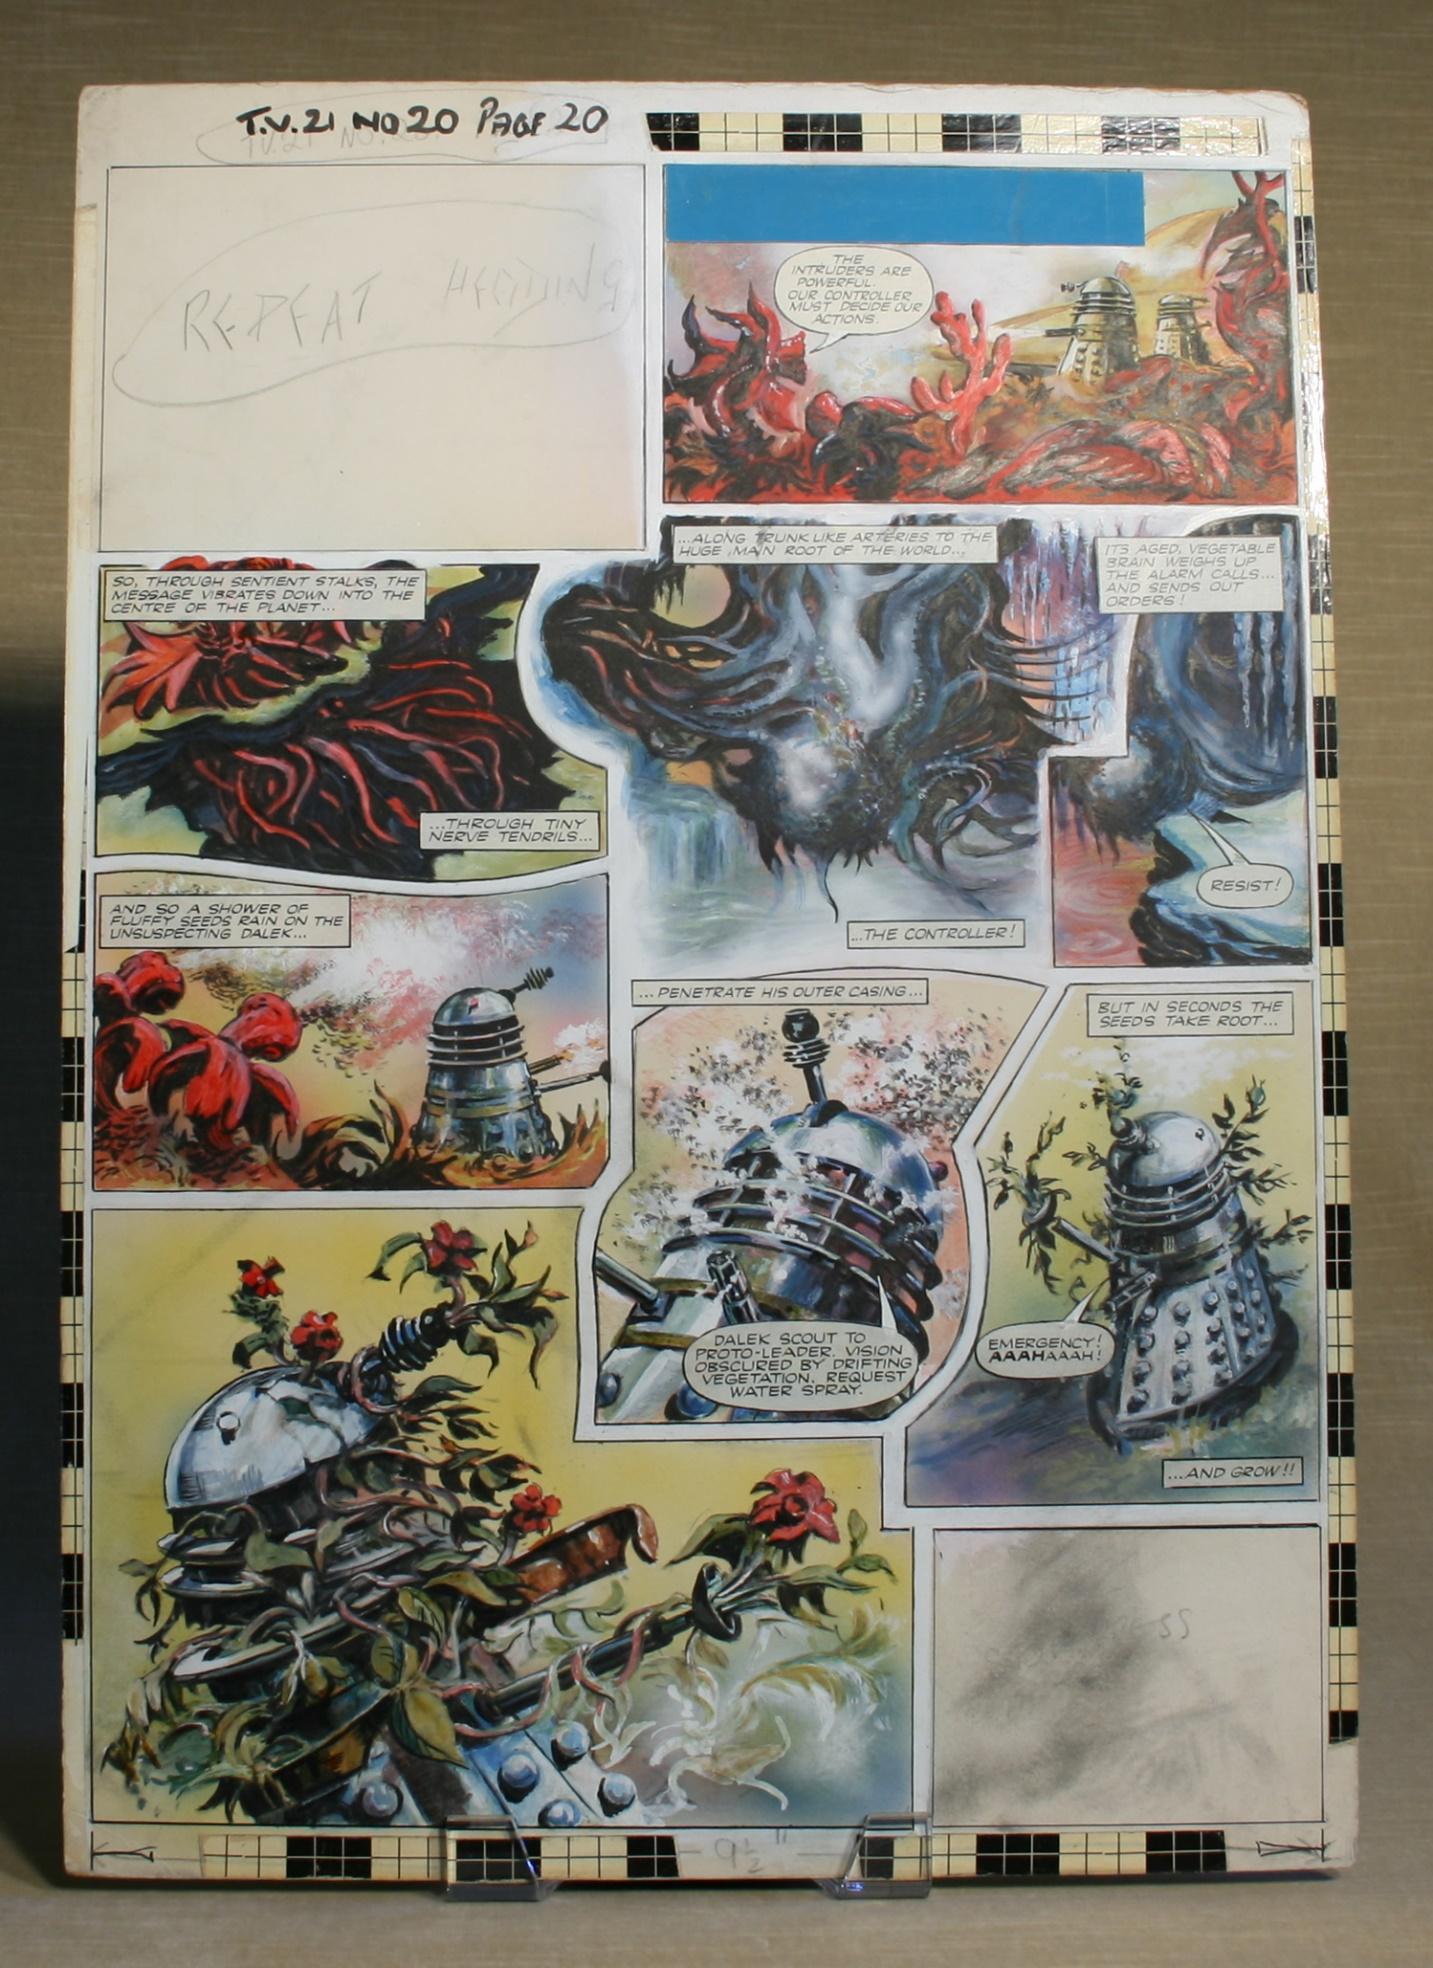 Original Dalek strip artwork, TV Century 21 #20